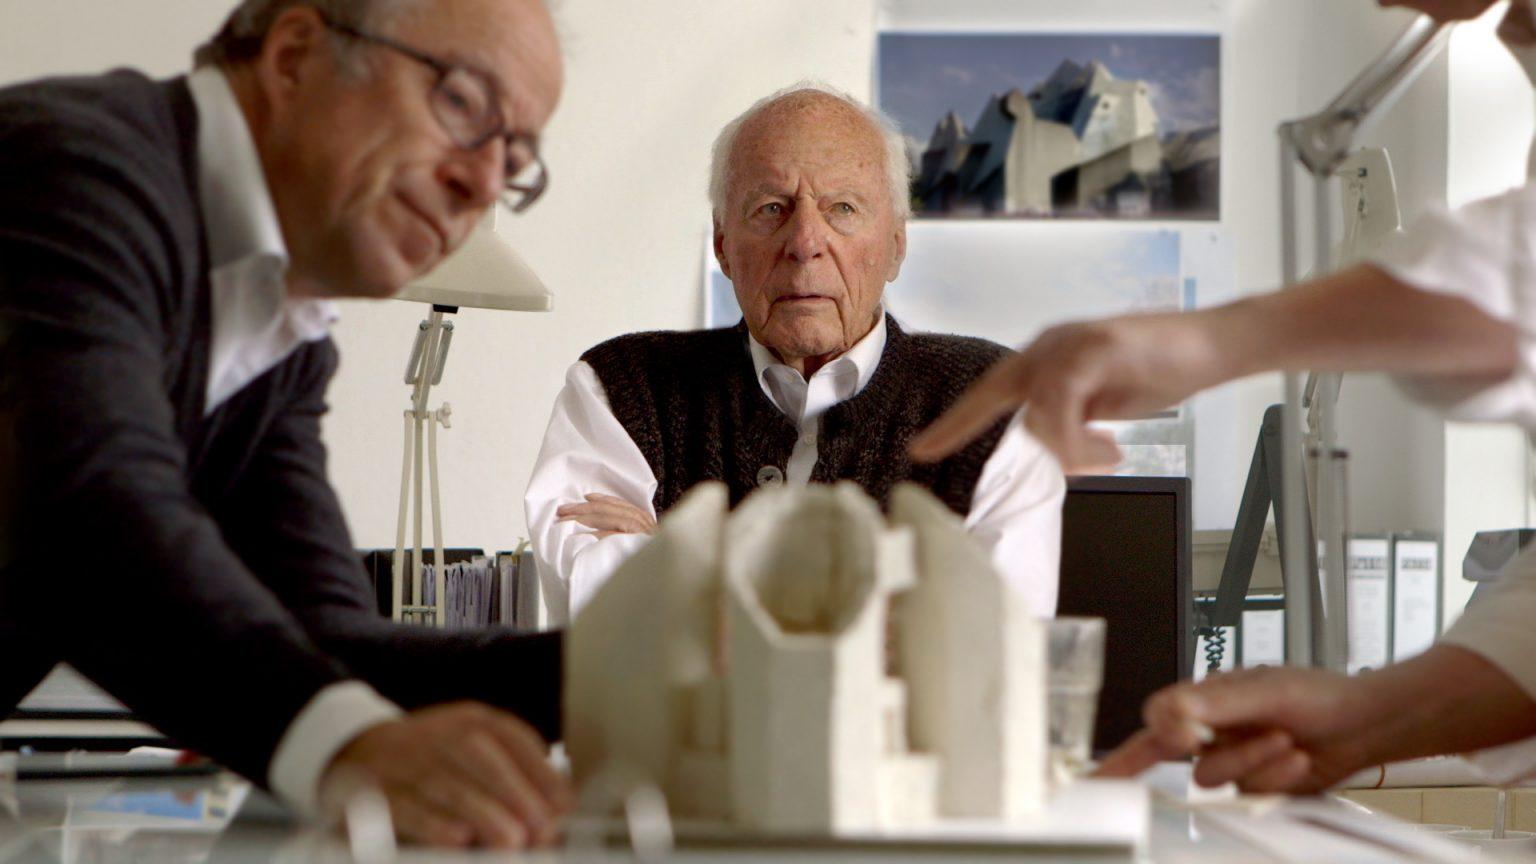 Pritzker Prize Laureate Gottfried Bohm Passes Away പ്രിറ്റ്സ്കർ പ്രൈസ് ജേതാവ് ഗോട്ട്ഫ്രഡ് ബോം അന്തരിച്ചു_40.1